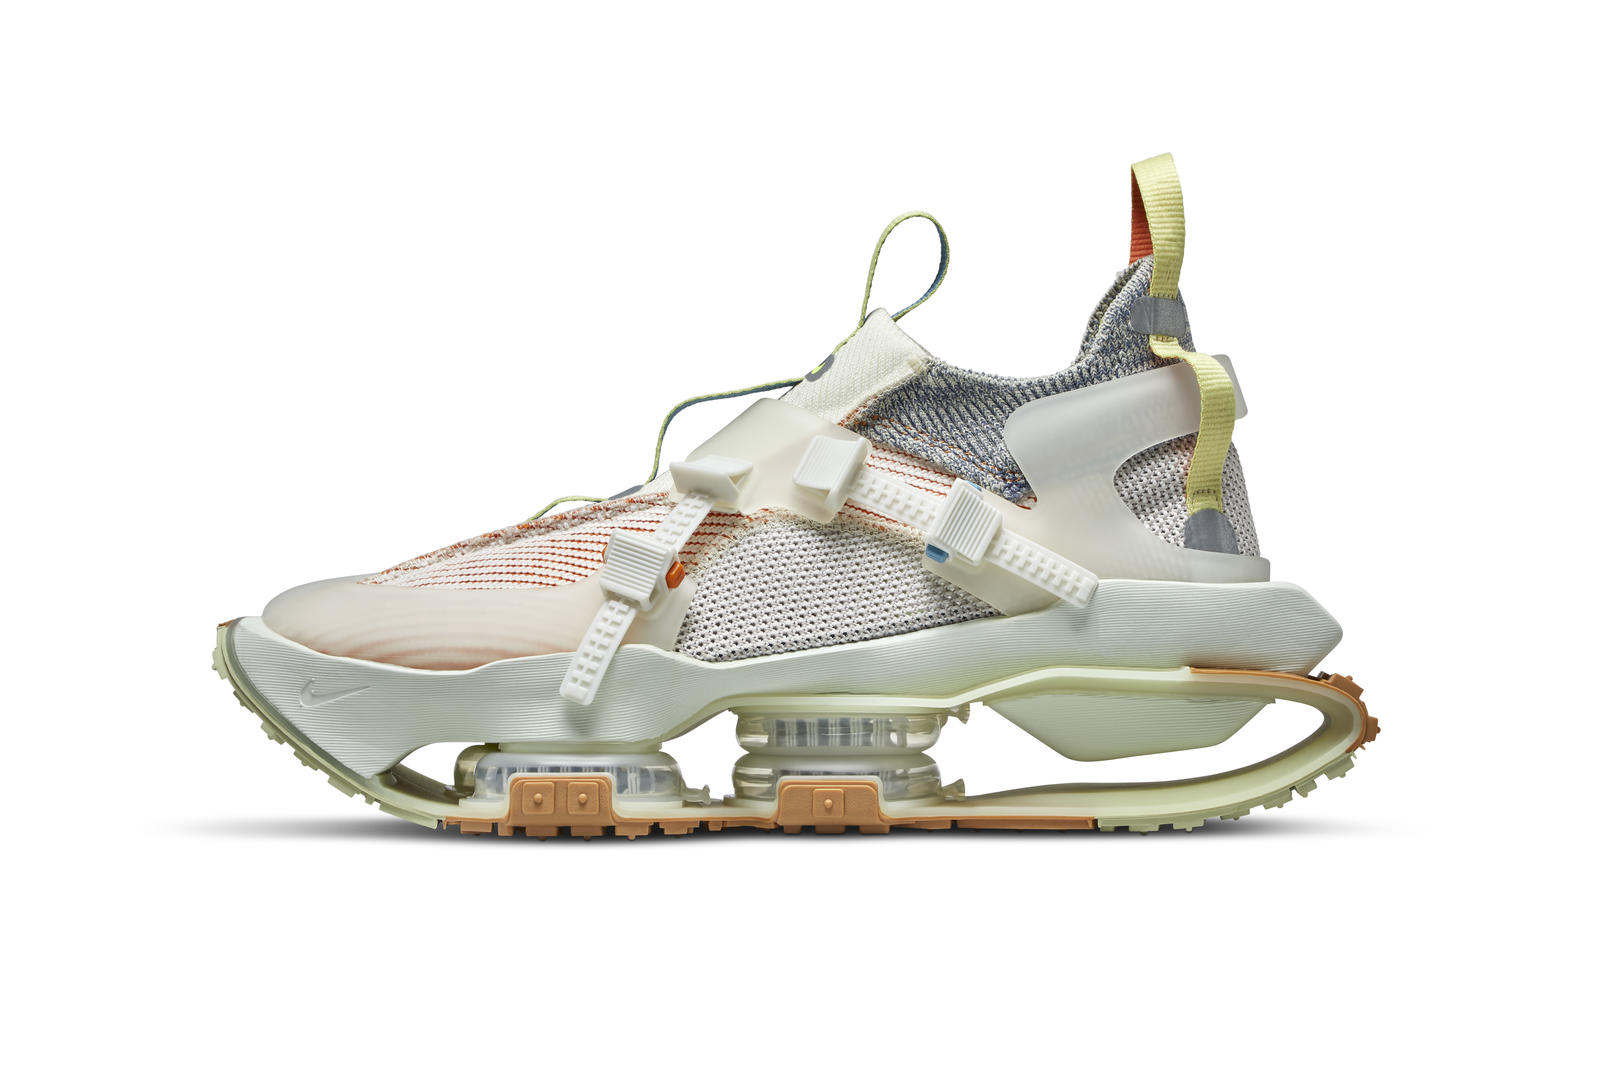 Nike ISPA 2020 Preview 3